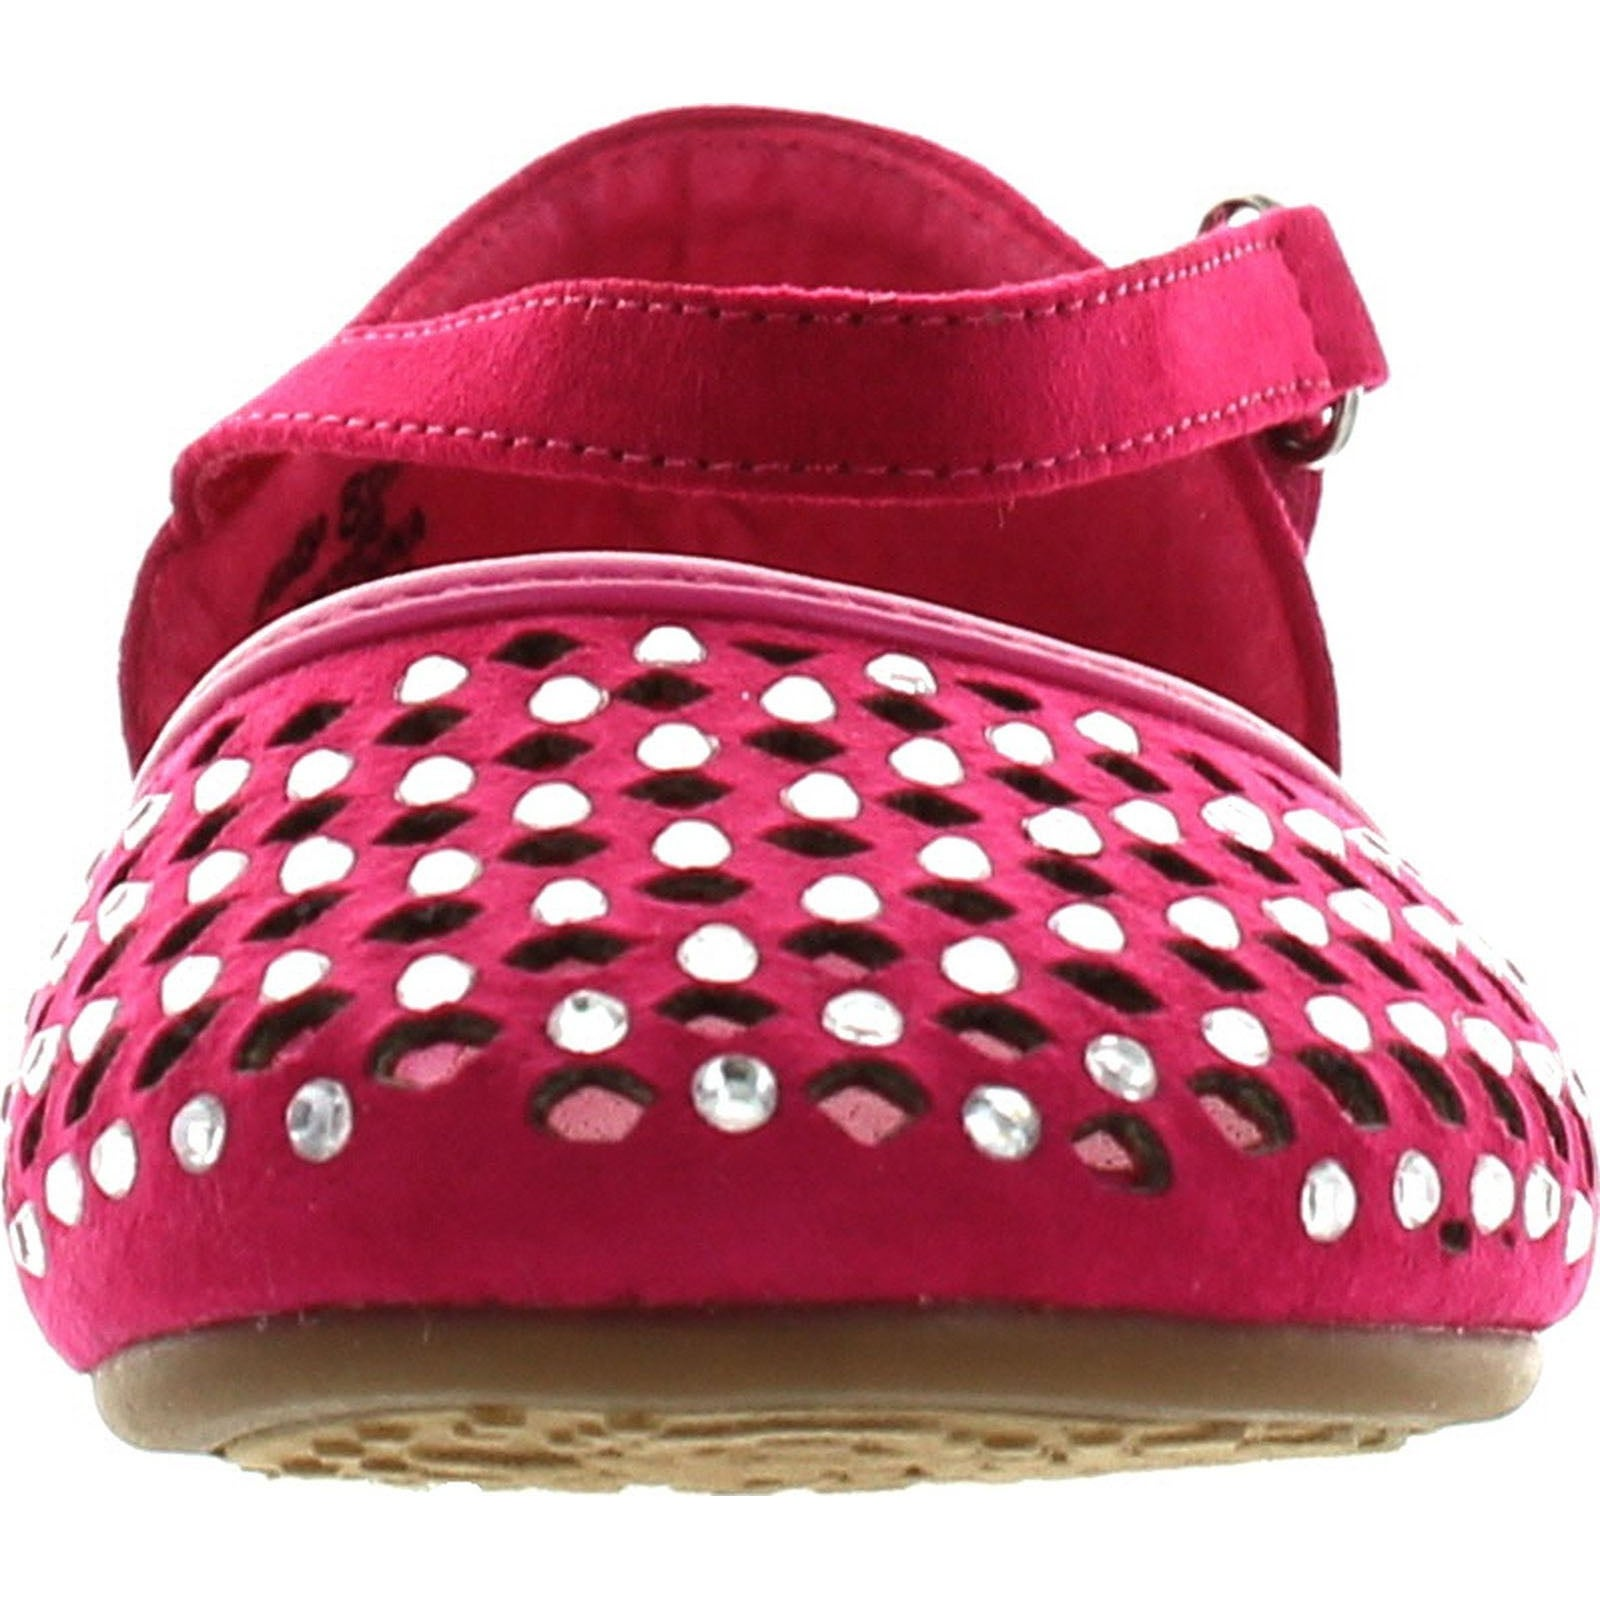 2eb73735c2cff ... Shop Jelly Beans Capa Kid s Big Girls Ankle Strap Rhinstone Ornament  Sandals Shoes - Free  Teva Toachi 4 ...